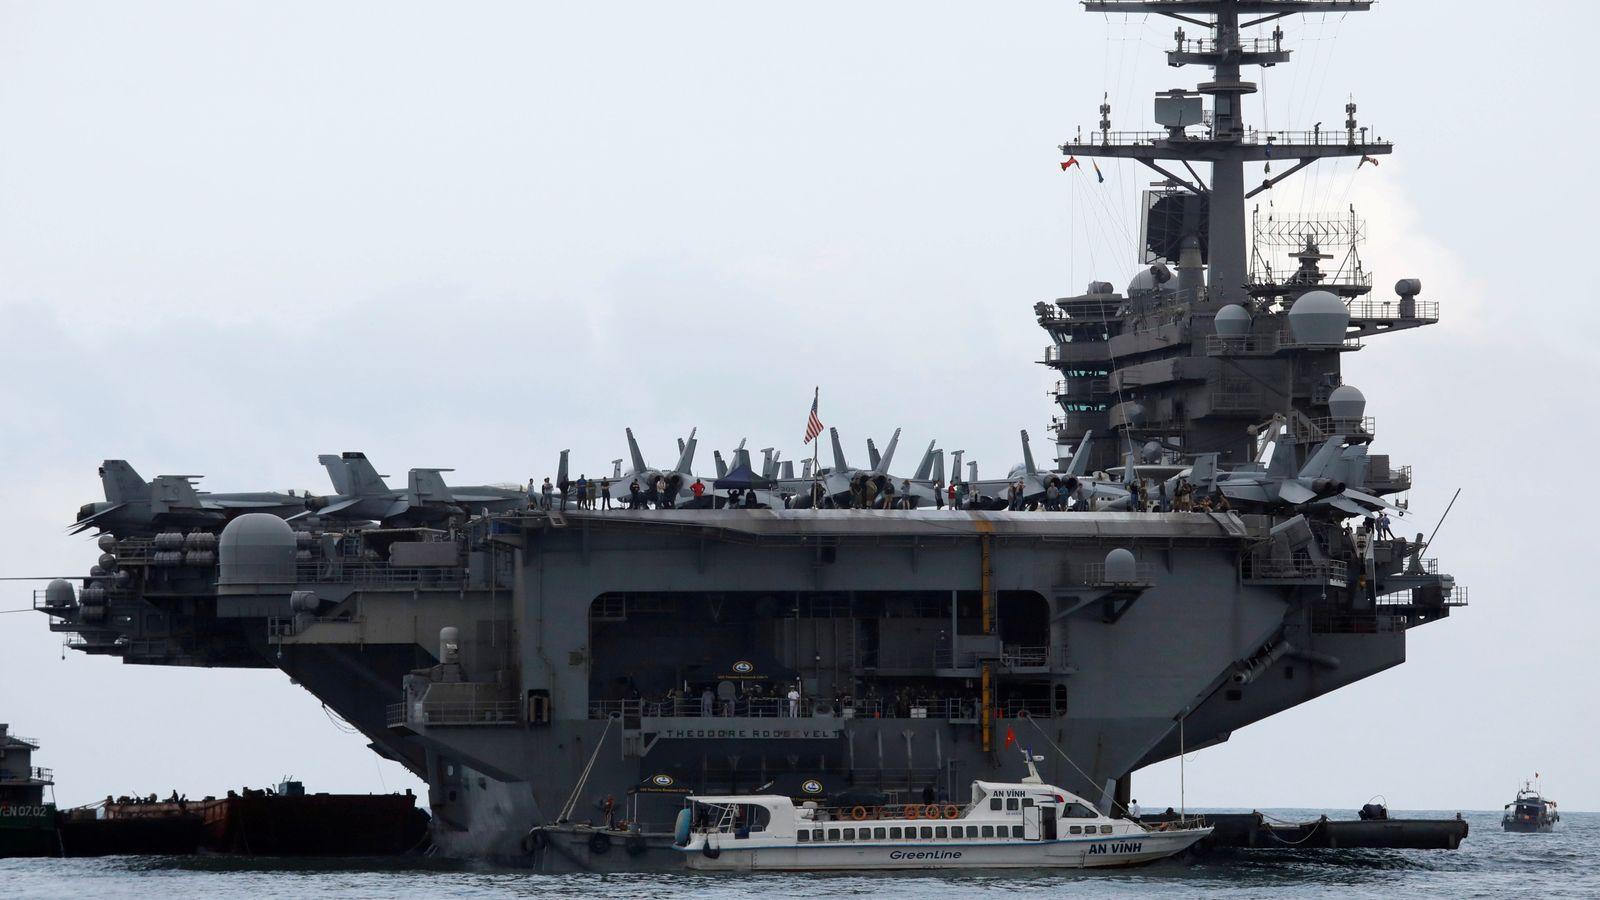 Coronavirus: US warship captain 'relieved of duty' over COVID-19 memo